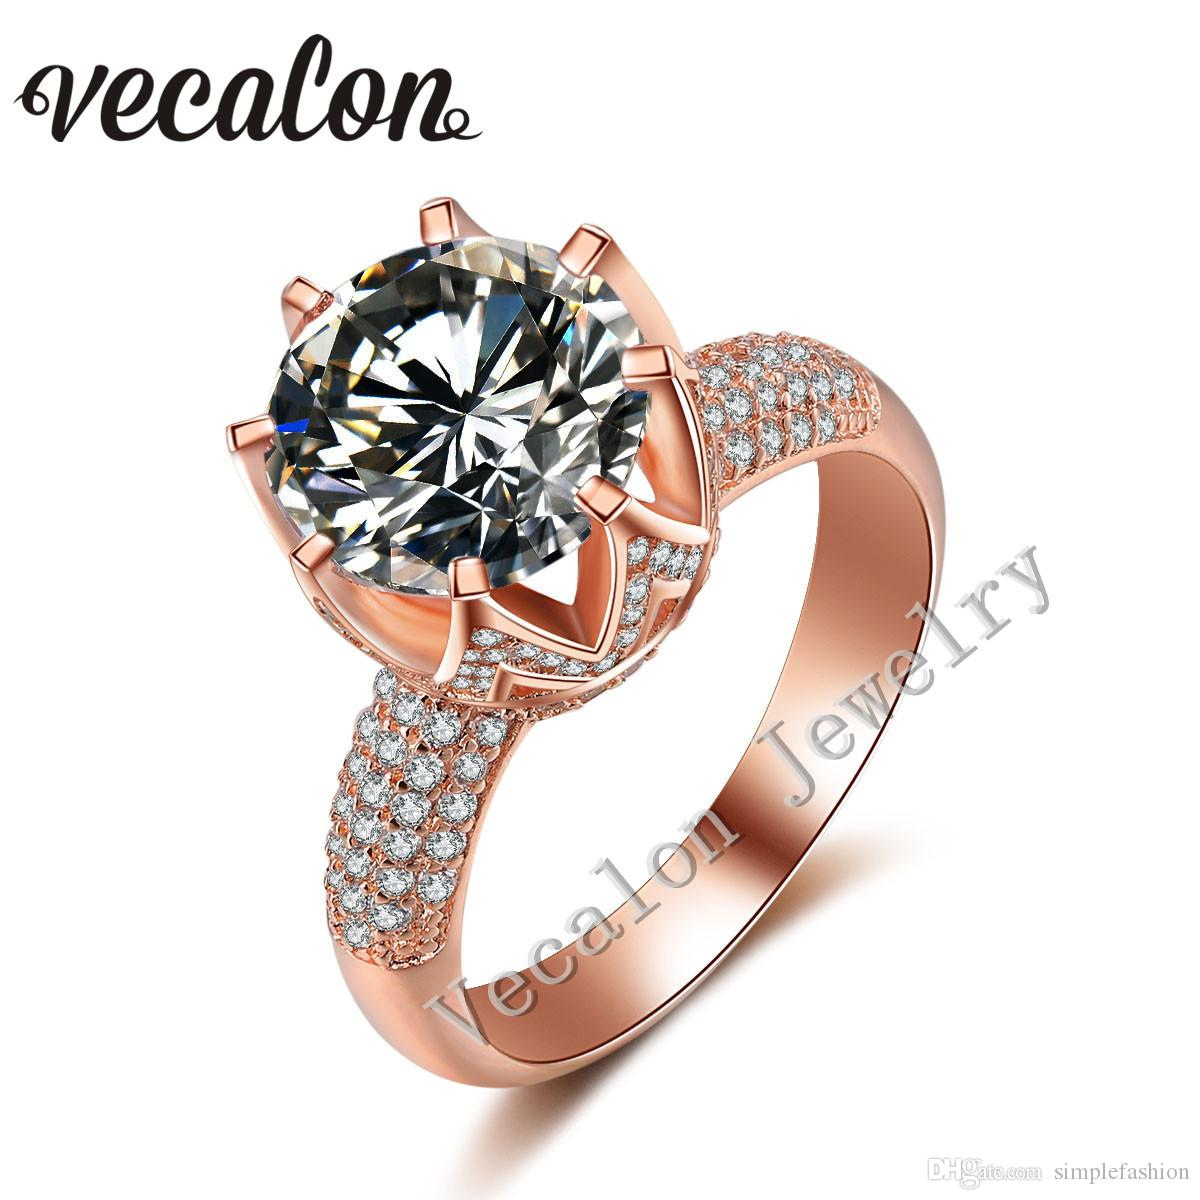 2017 vecalon rose gold wedding ring for women round cut 6ct